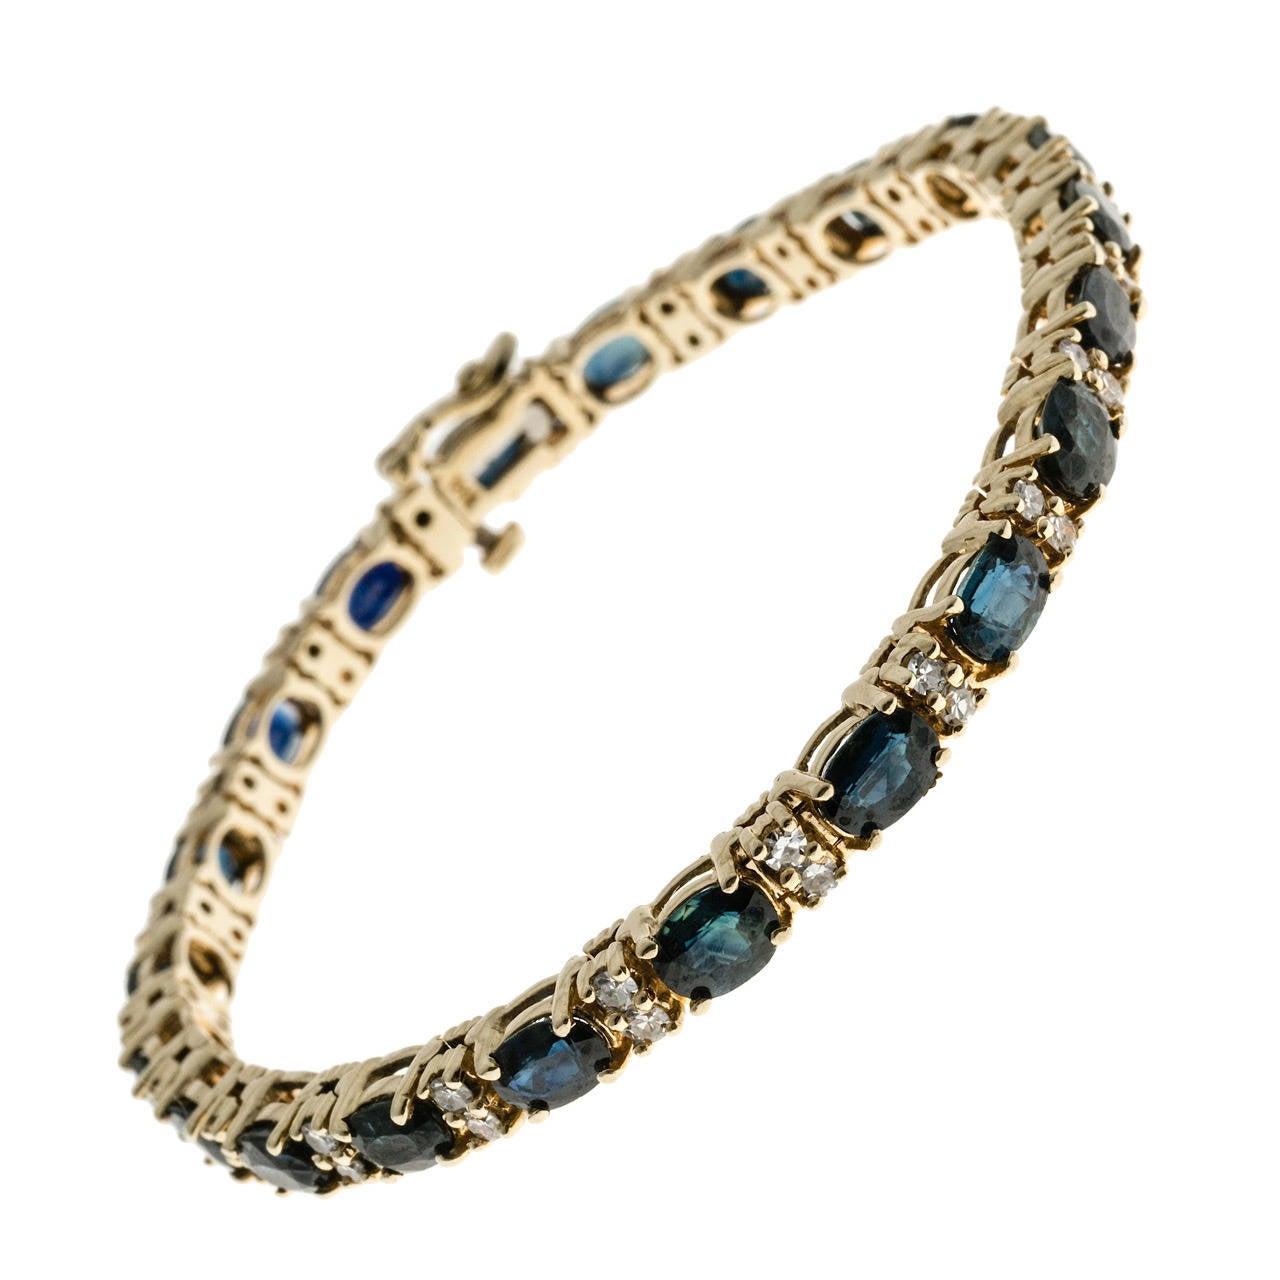 Oval Royal Sapphire Diamond Gold Hinged Link Bracelet 1